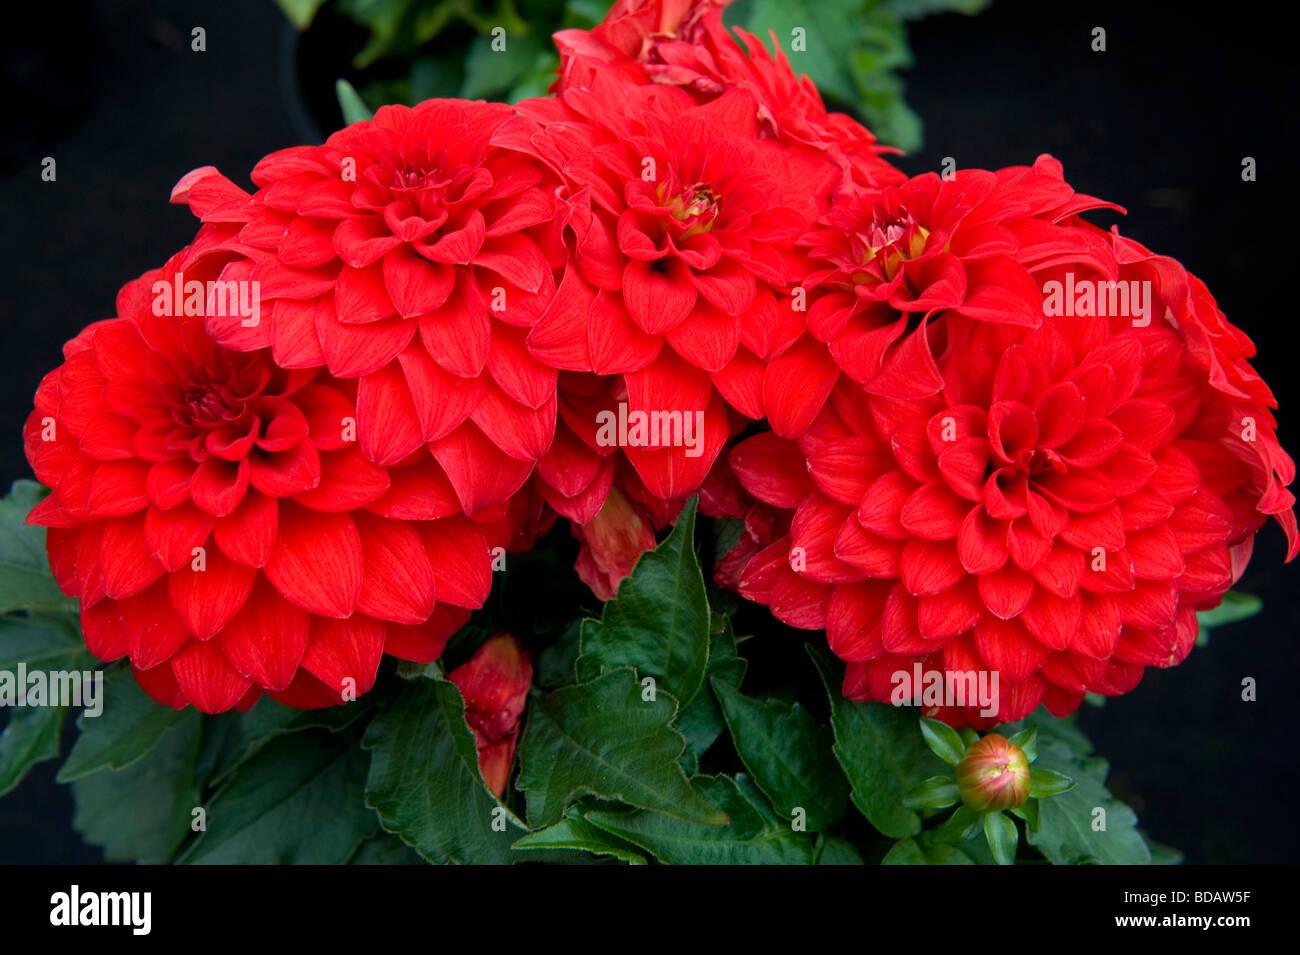 Dahlia `Davenport Lesley` ball head pot grown. Bright red flowers. - Stock Image